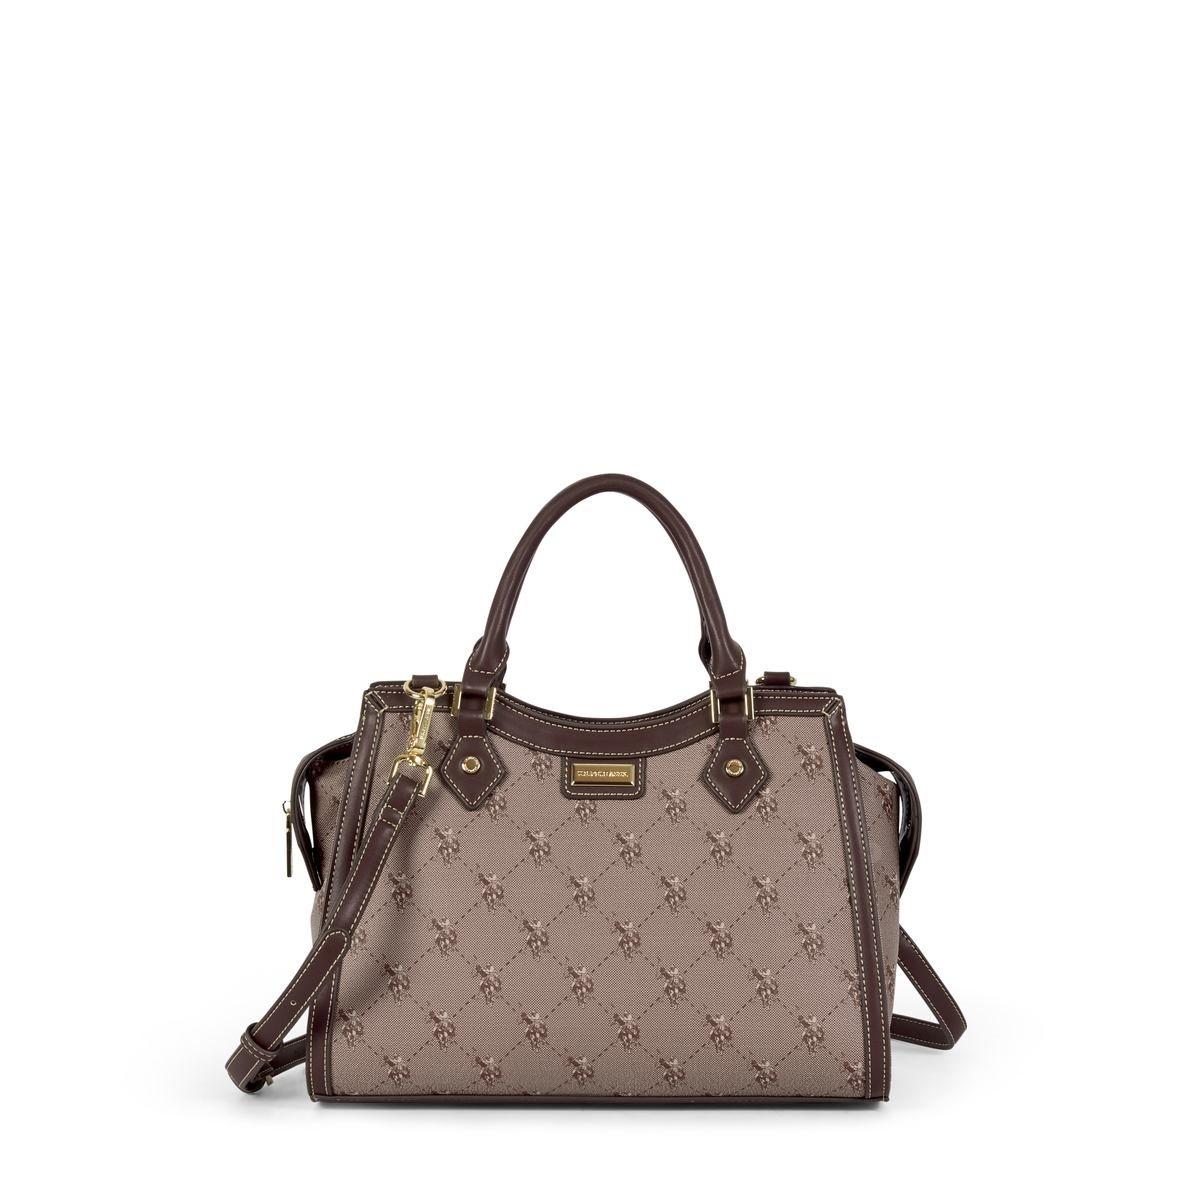 US Polo Assn. Τσάντα χειρός γυναικεία 33x15x23cm Hampton Brown